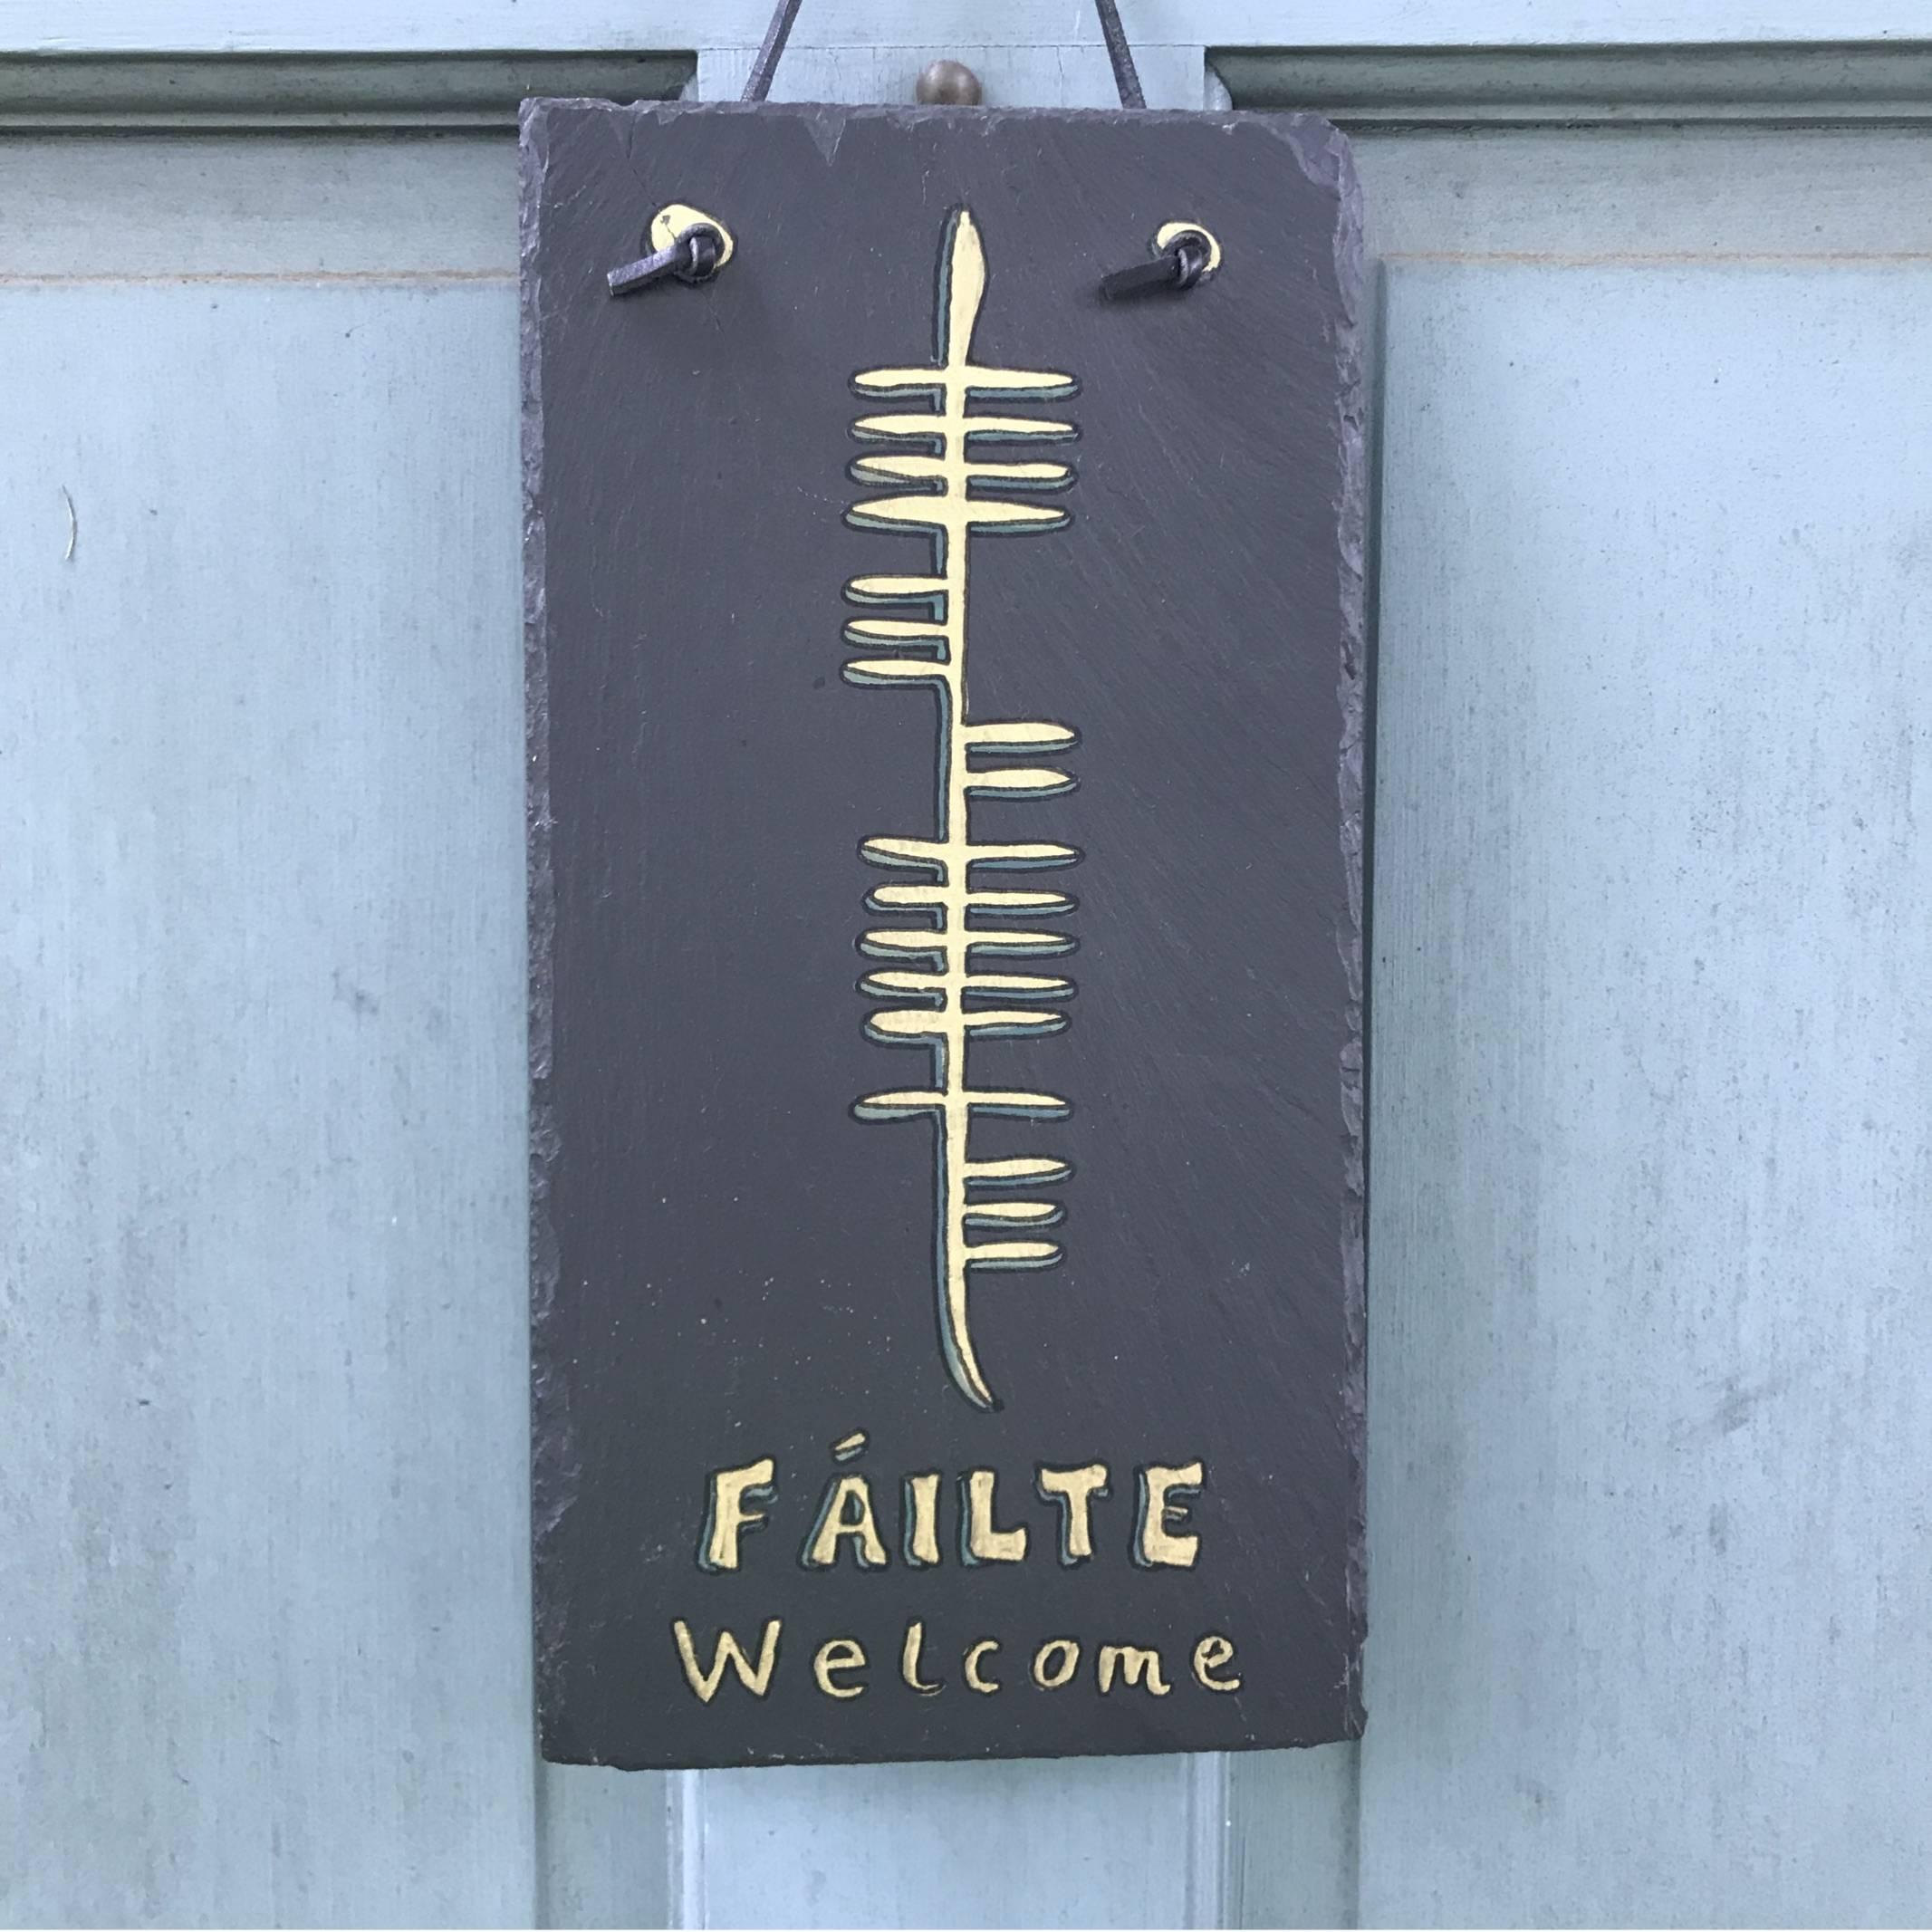 Ogham Art Welcome Failte Slate Plaque Celtic Festival Online